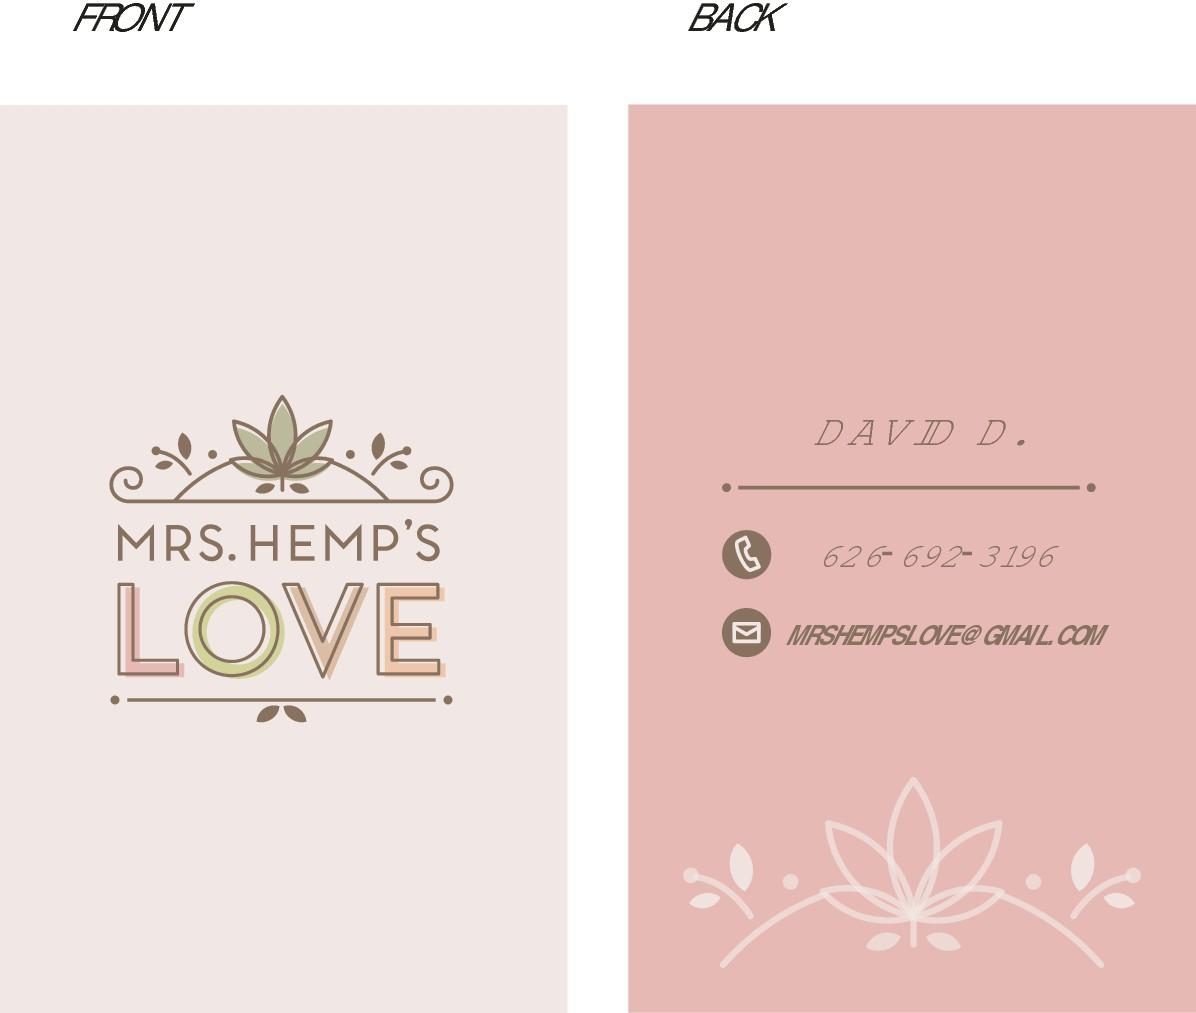 Mrs. Hemp's Love - Edible Infusions